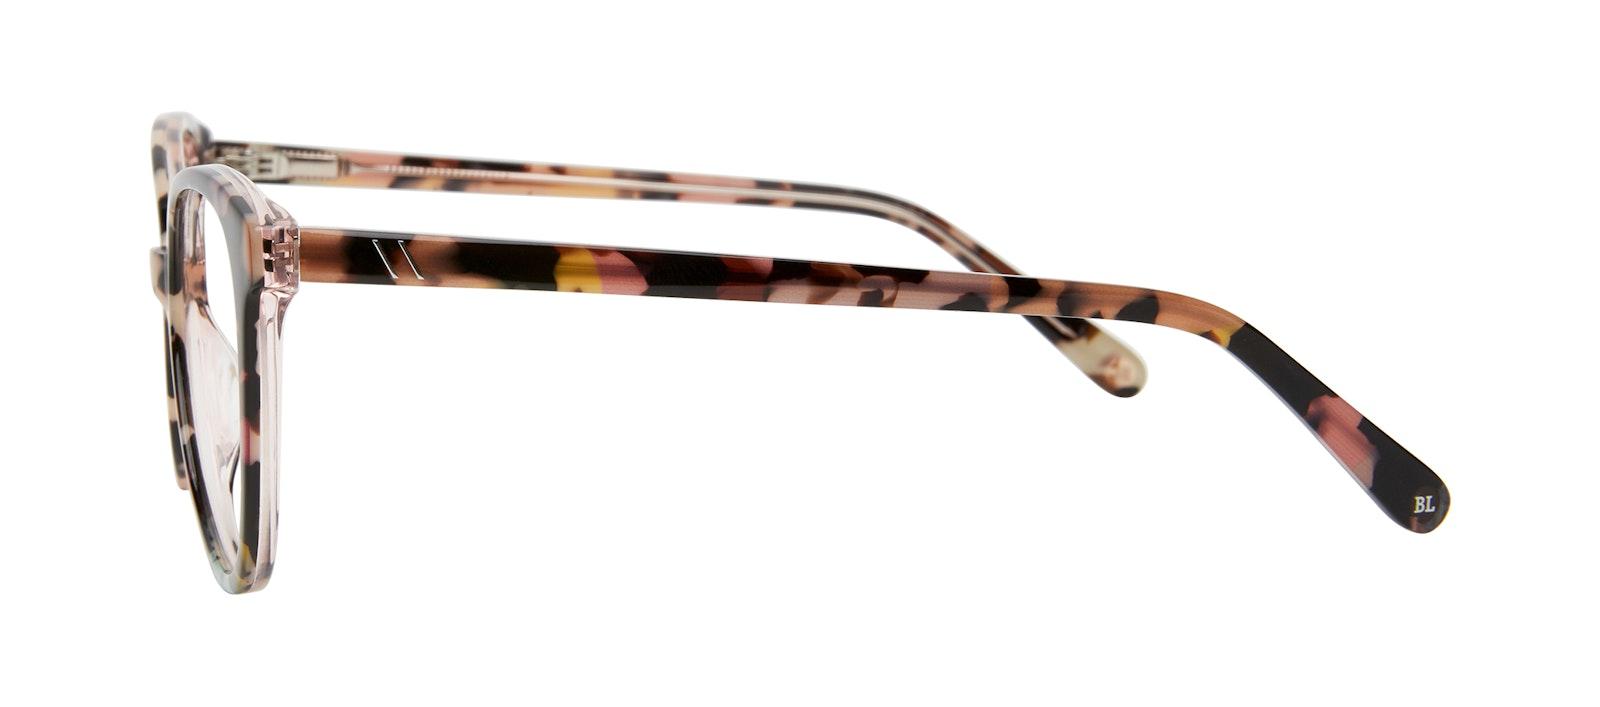 Affordable Fashion Glasses Cat Eye Eyeglasses Women Esprit Pastel Tort Side